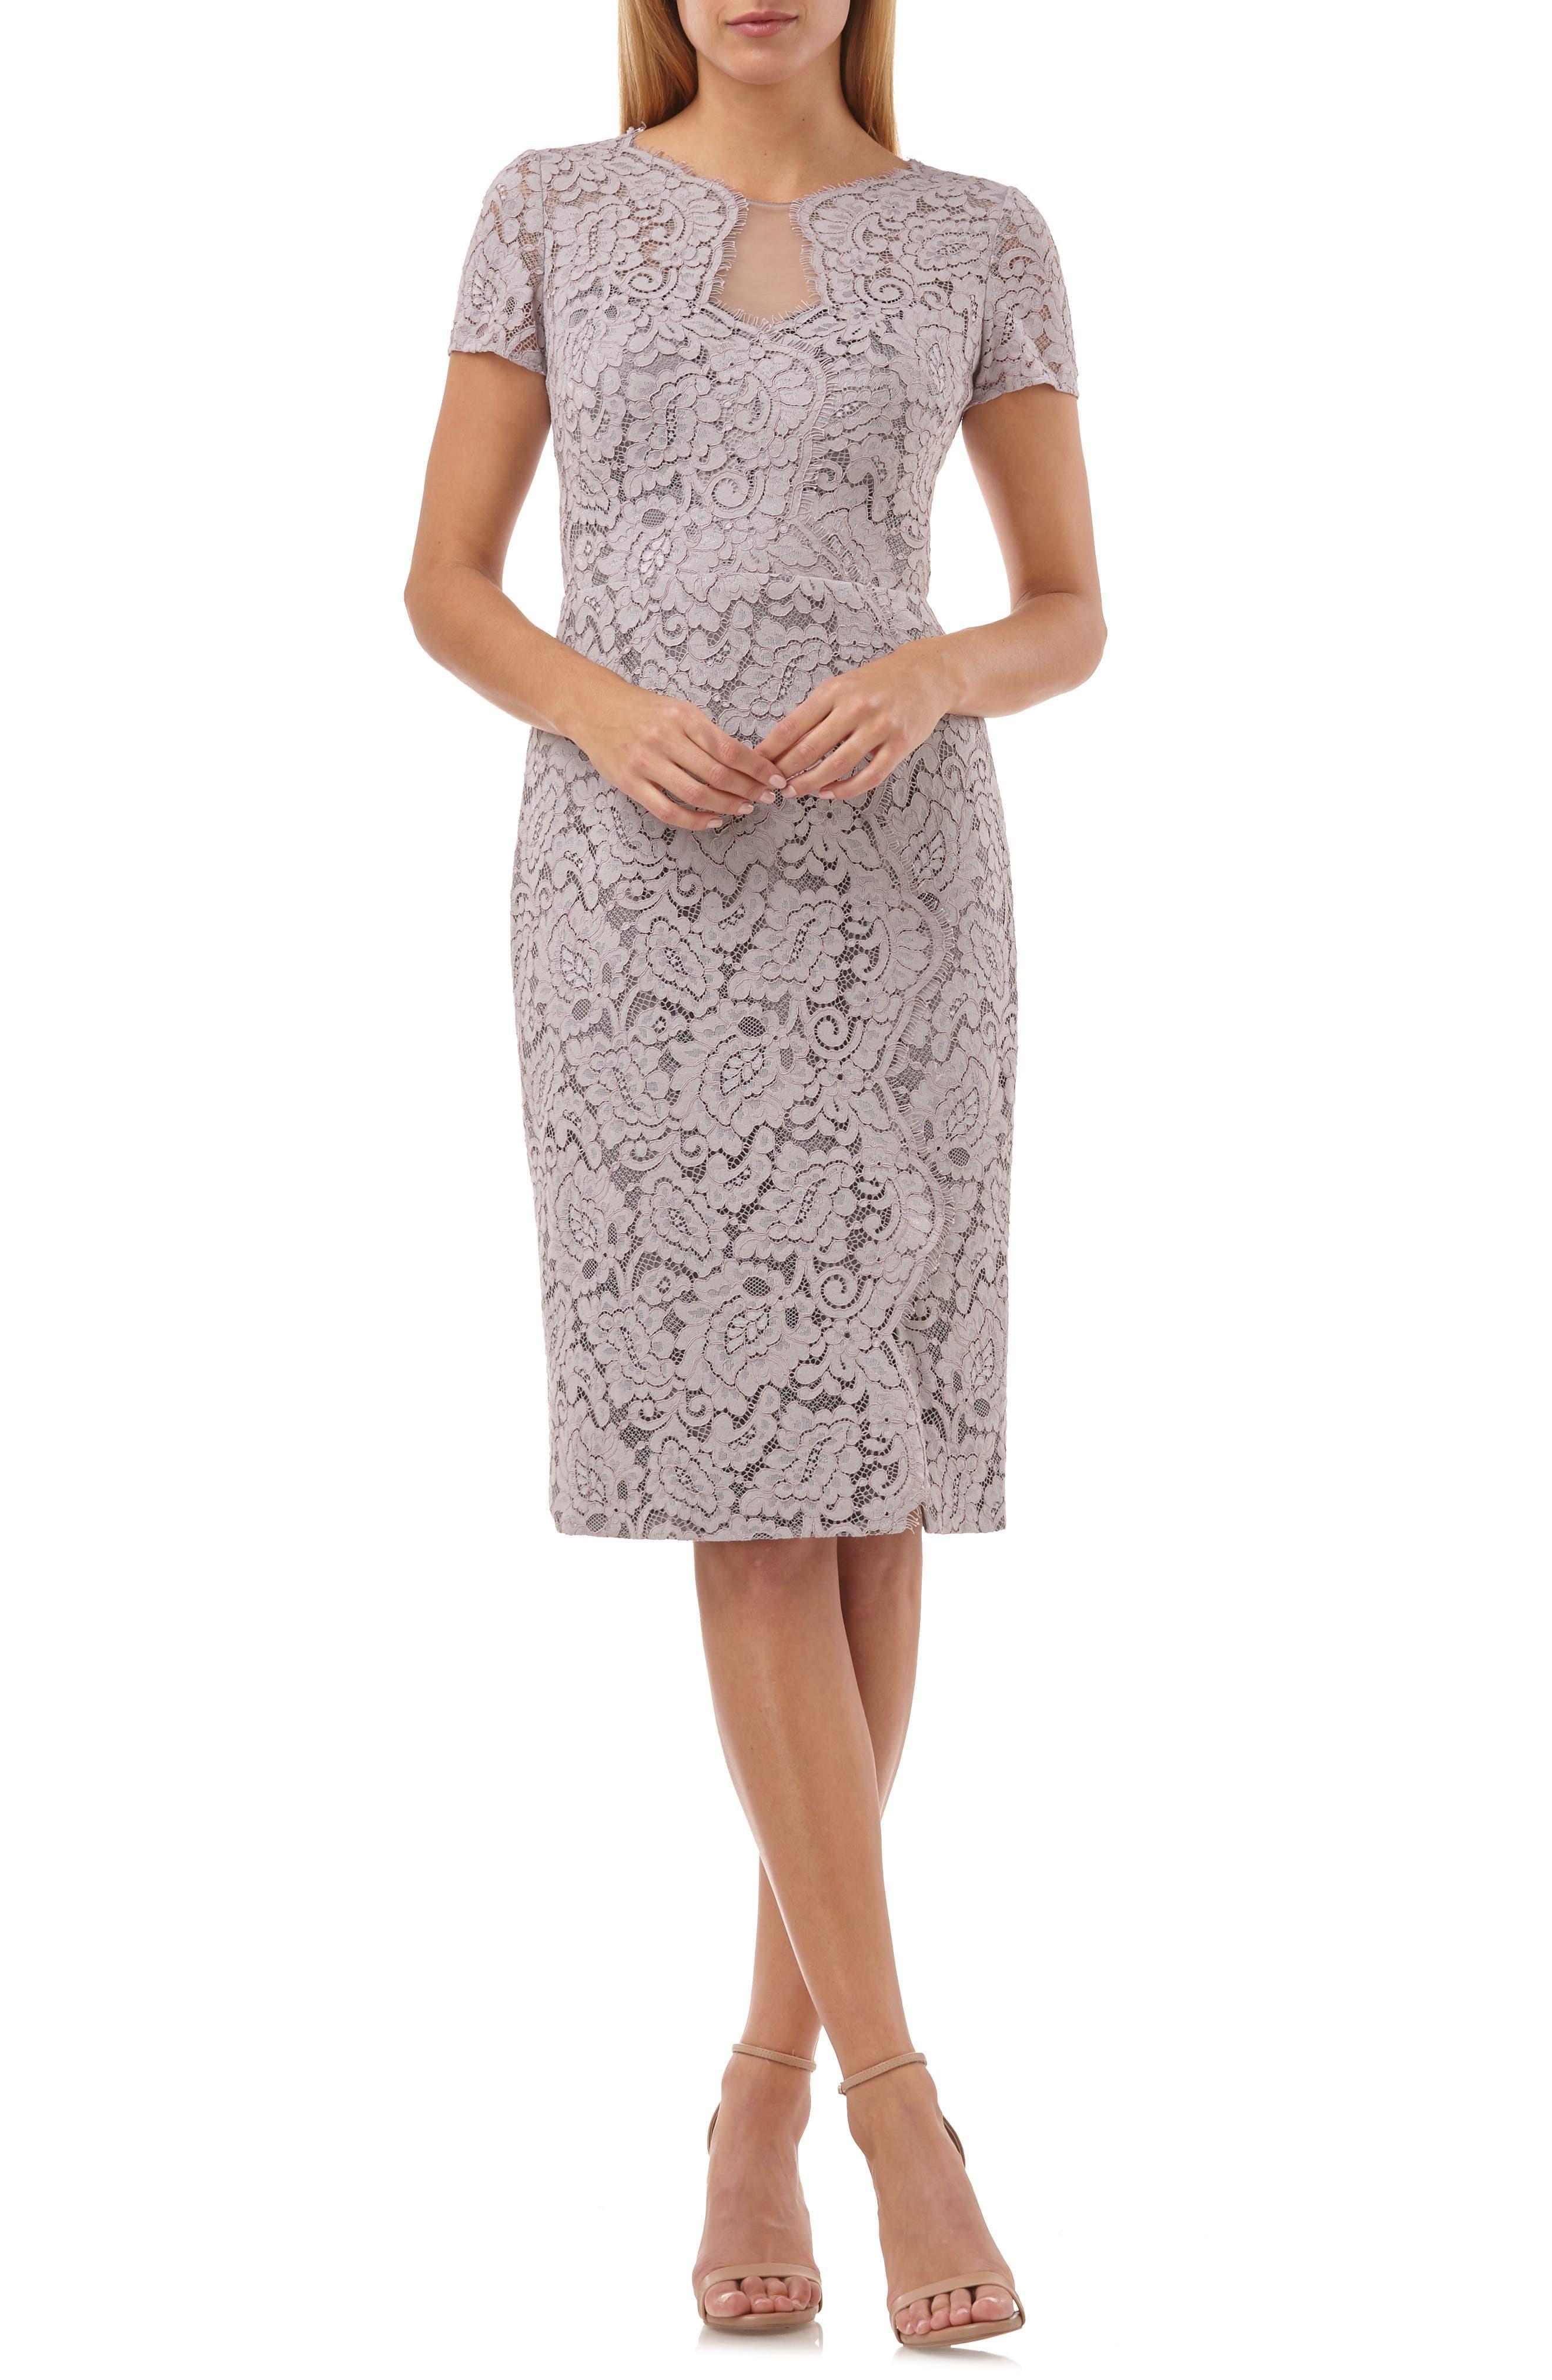 Js Collections Lace Cocktail Dress, Beige